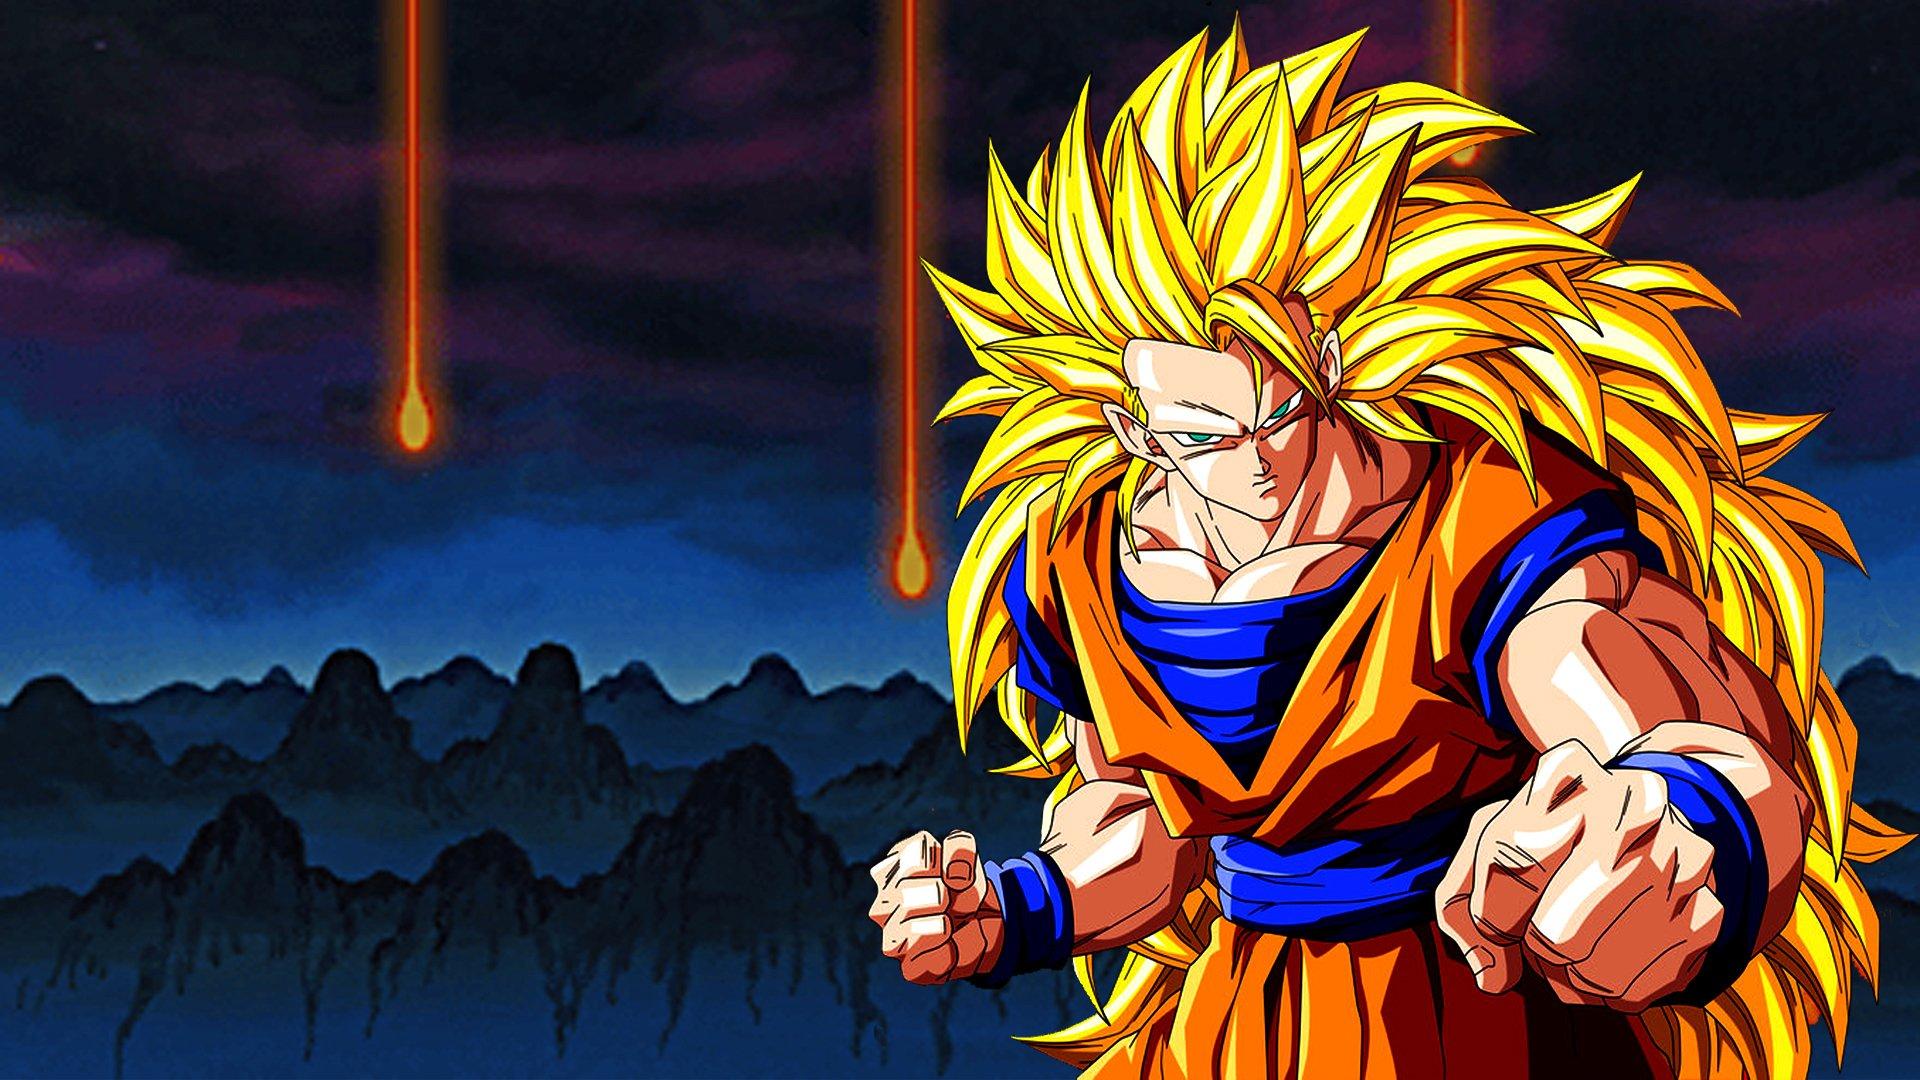 14 Dragon Ball Z: Budokai Tenkaichi 3 HD Wallpapers | Background